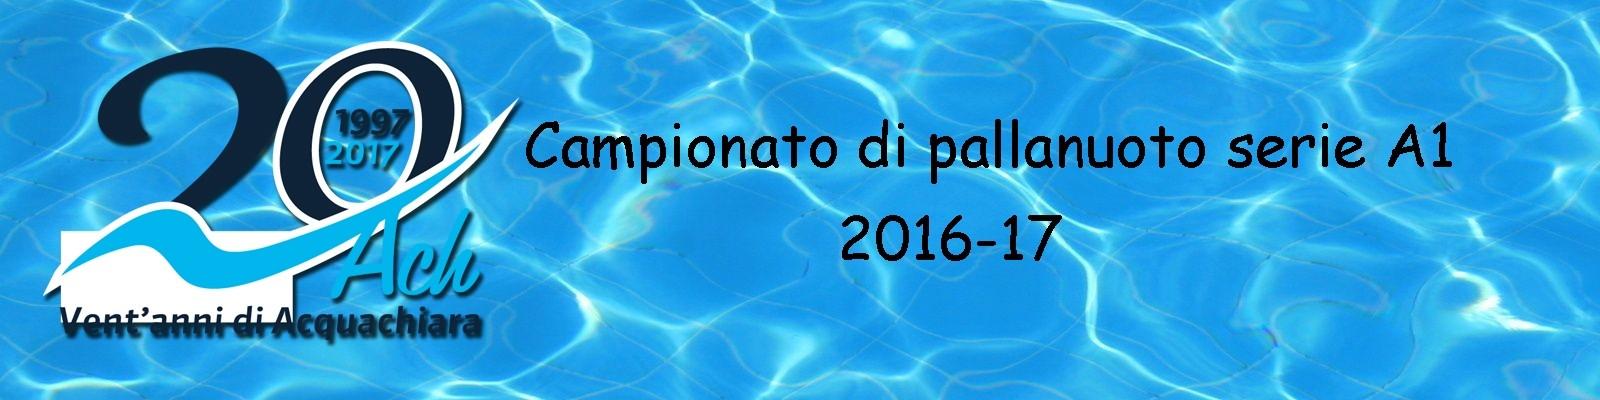 Acquachiara anno 2016-17